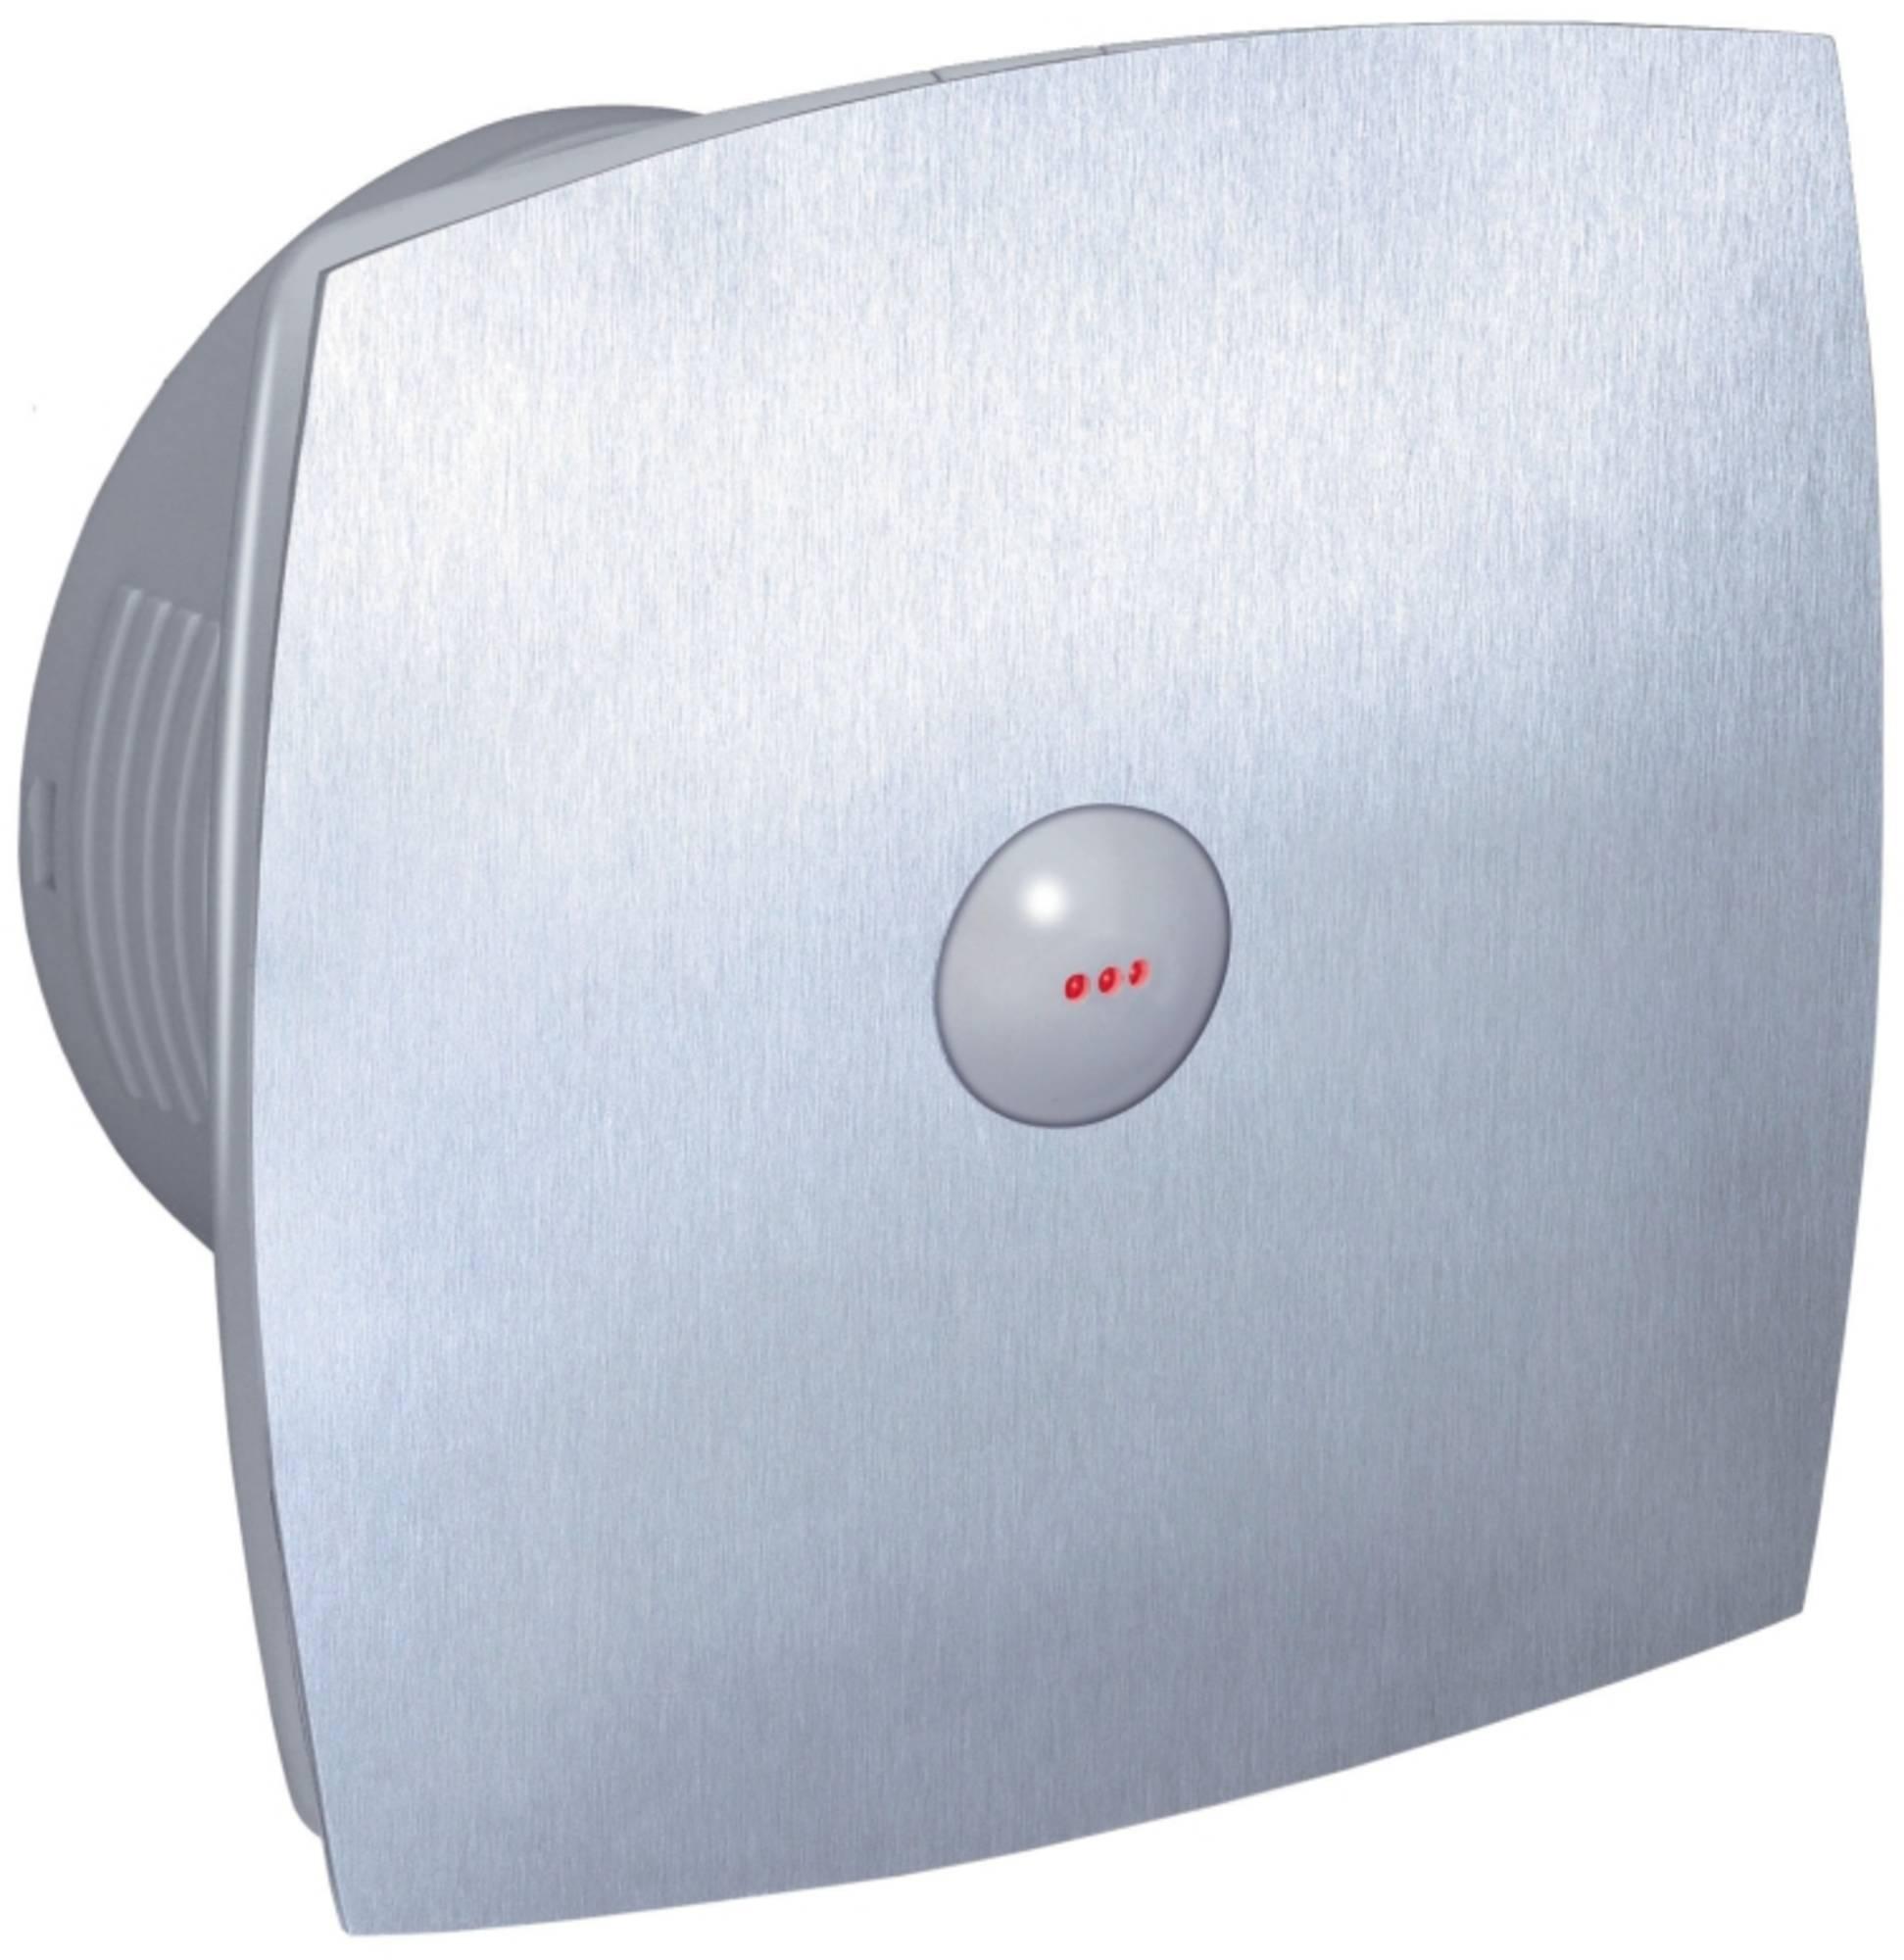 ITHO BTV 400 HT kanaalventilator met nadraaitimer hygrostaat RVS (3420060)